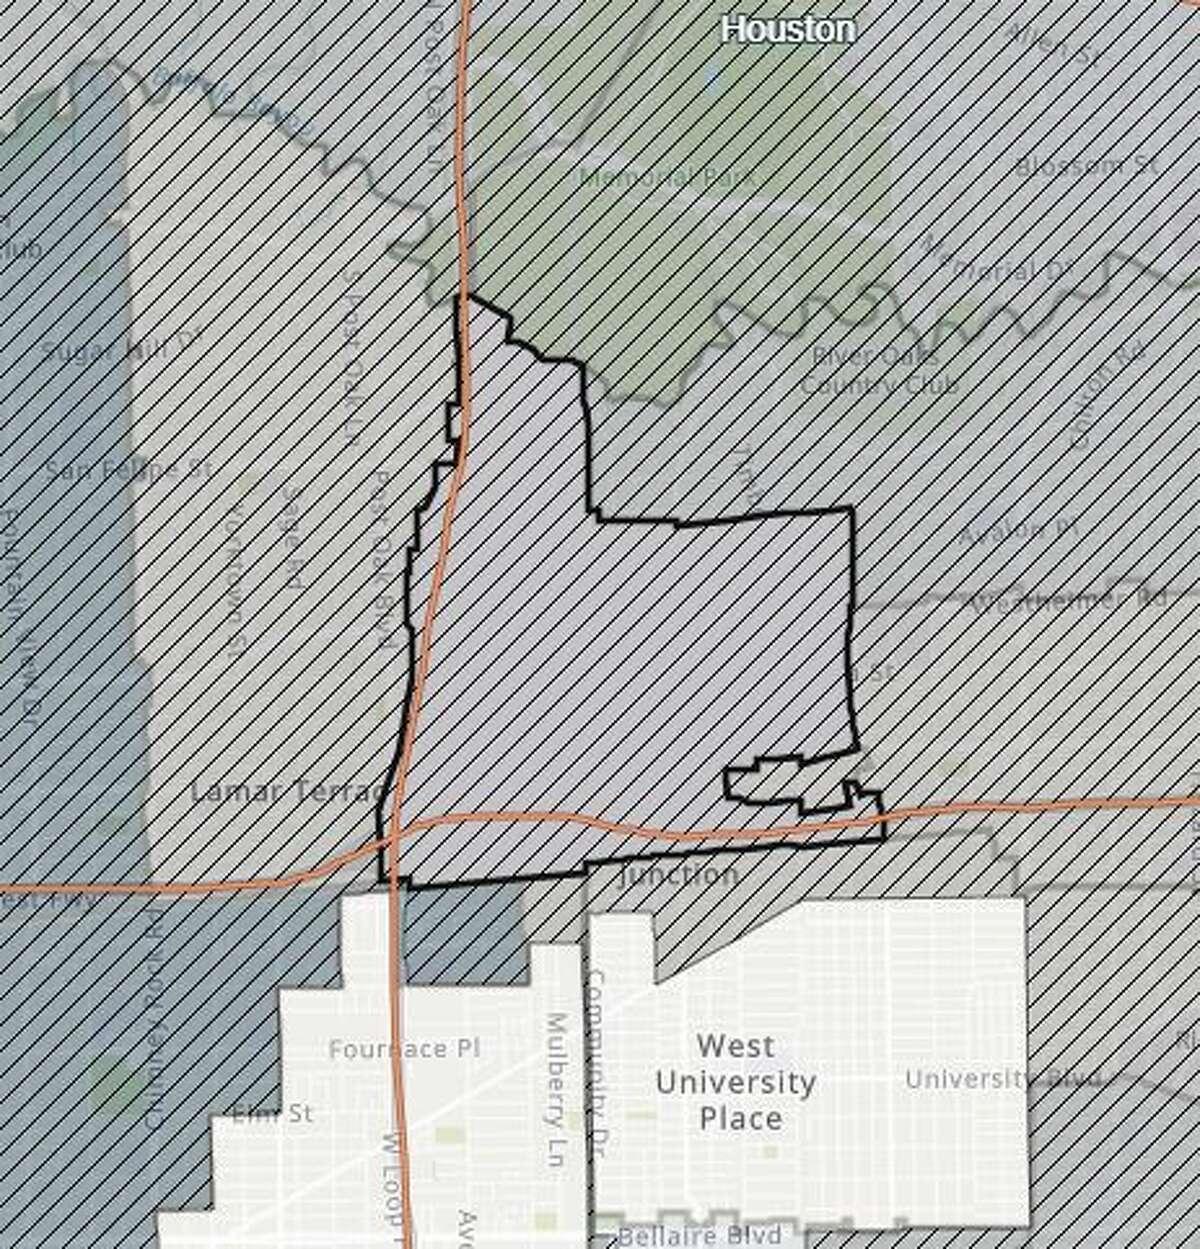 Harris County ZIP: 77027Number of confirmed cases: 30(As of June 10)